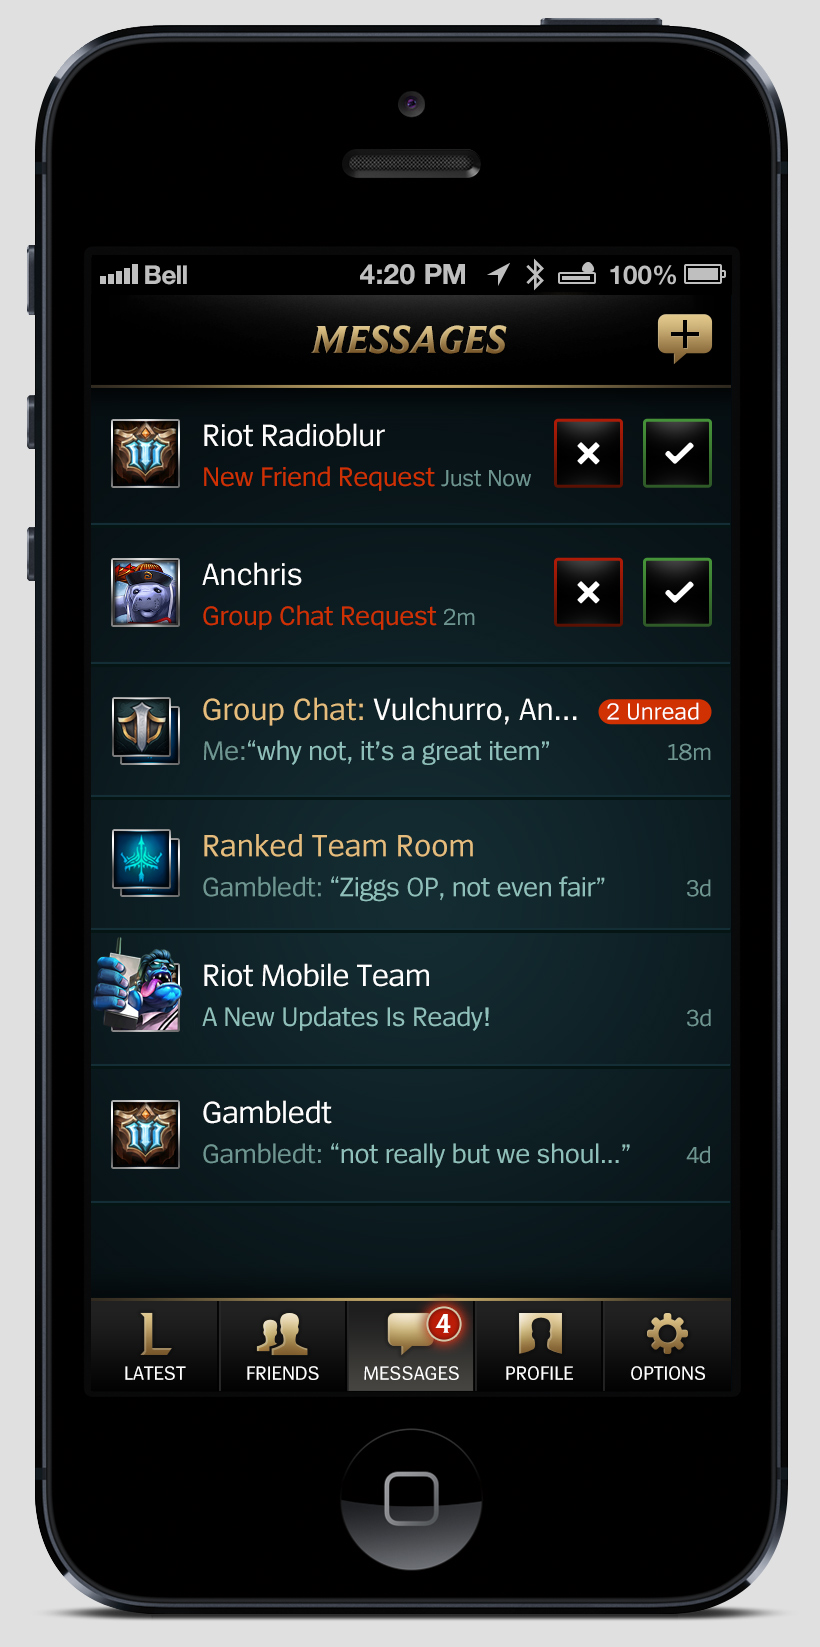 mobile_companion_18_friendsMessages.jpg